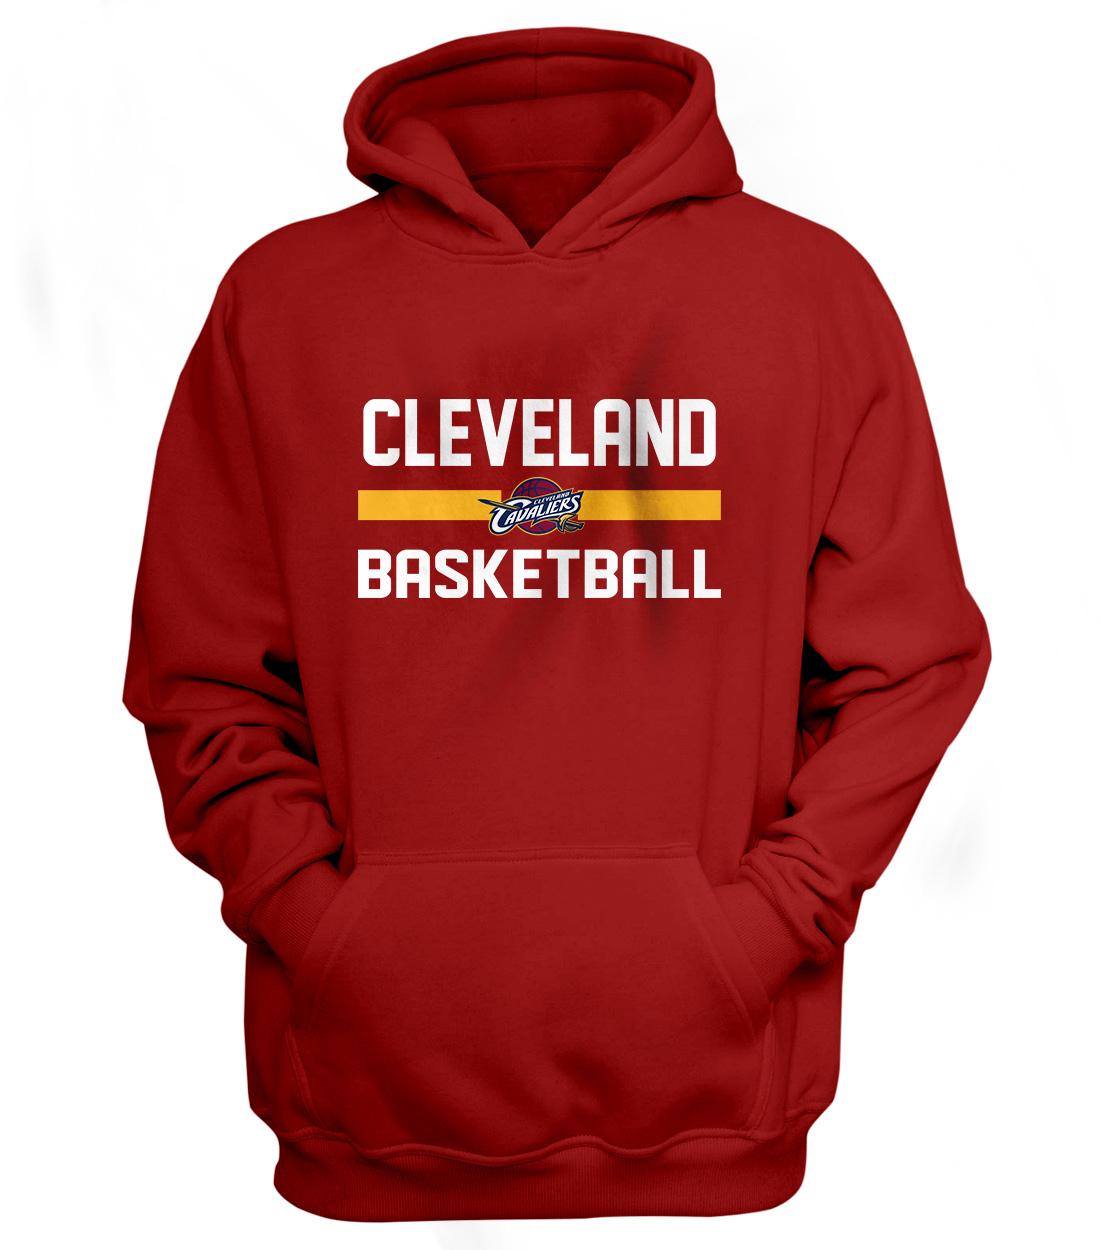 Cleveland Basketball Hoodie (HD-RED-NP-66-NBA-CLE-BASKETBALL)